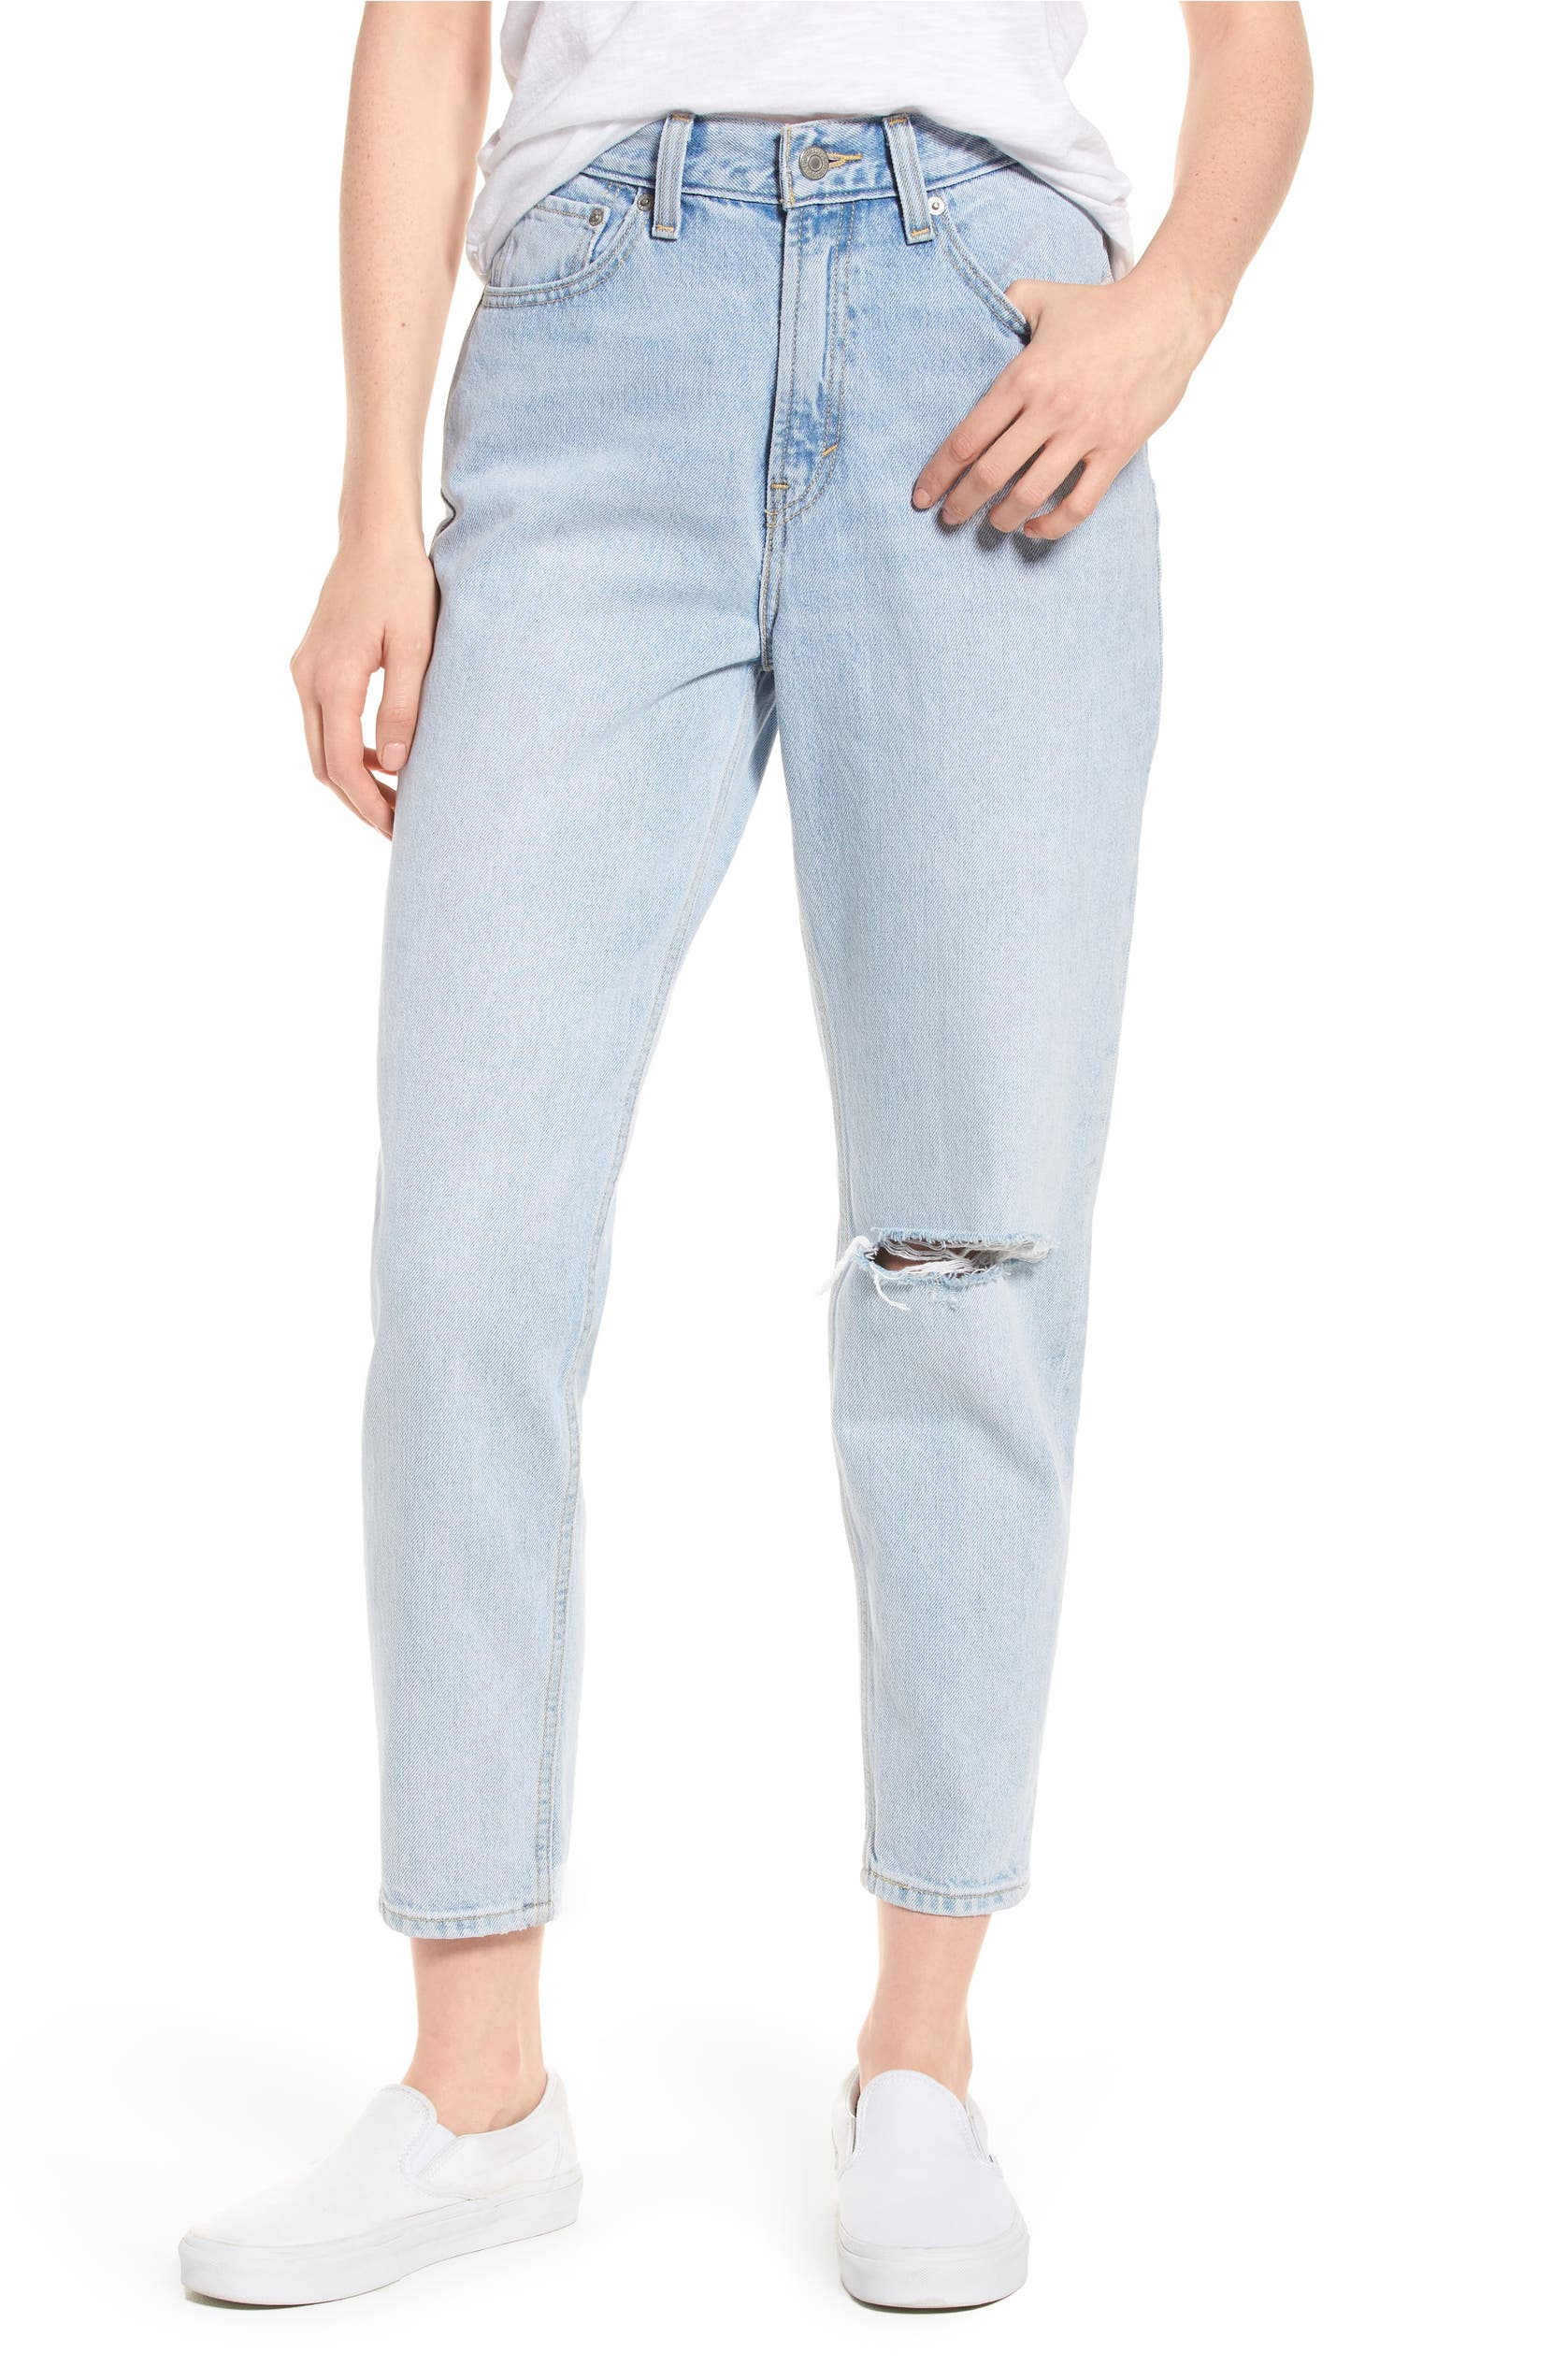 Mom Nordstrom donna Waist Martin Jeans High Levi's® SIwqYd66